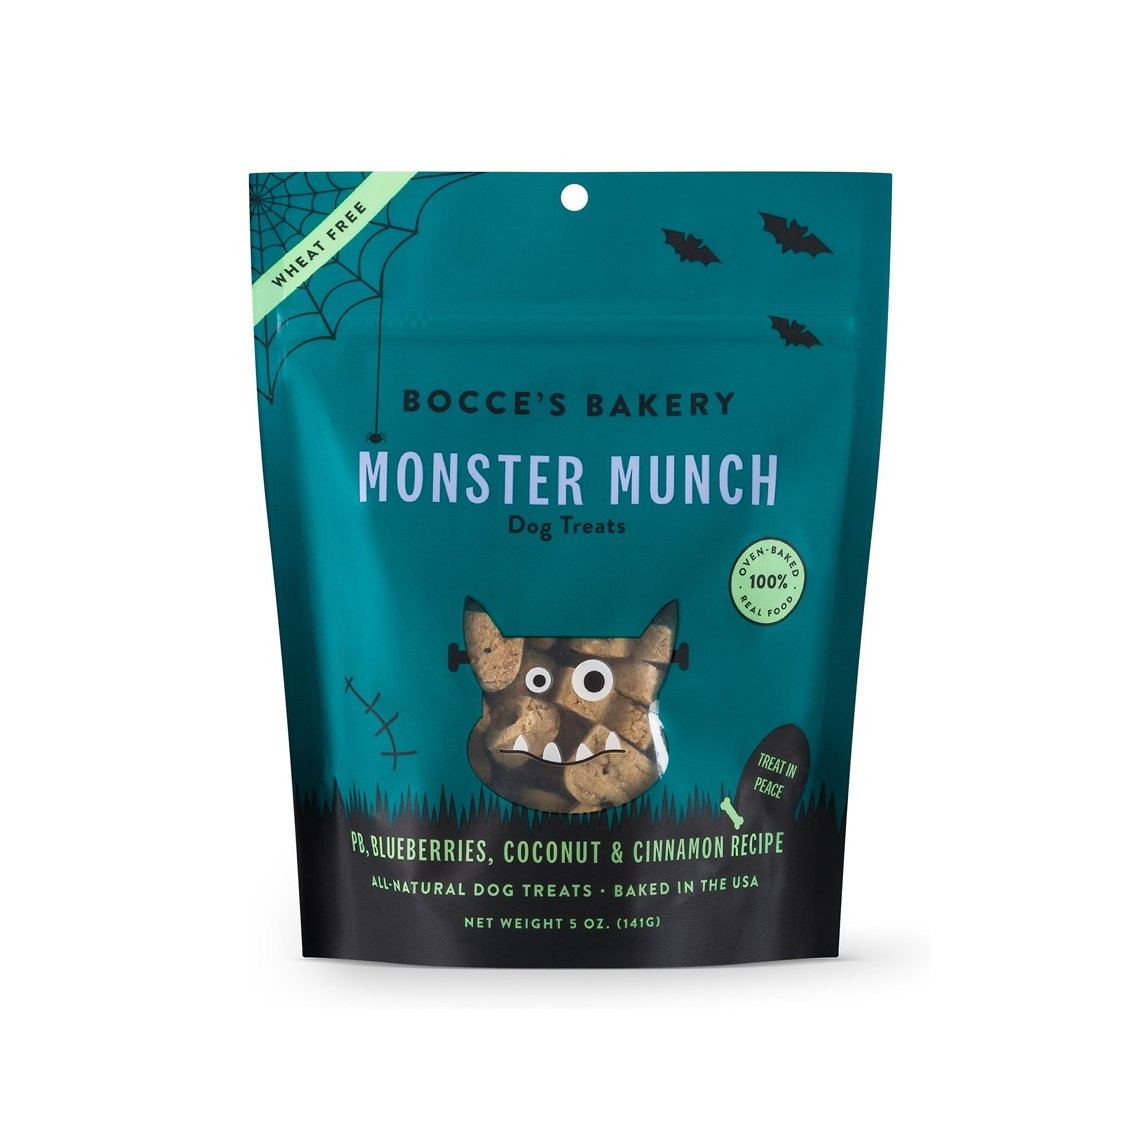 Bocce's Bakery Monster Munch Dog Treats, 6oz